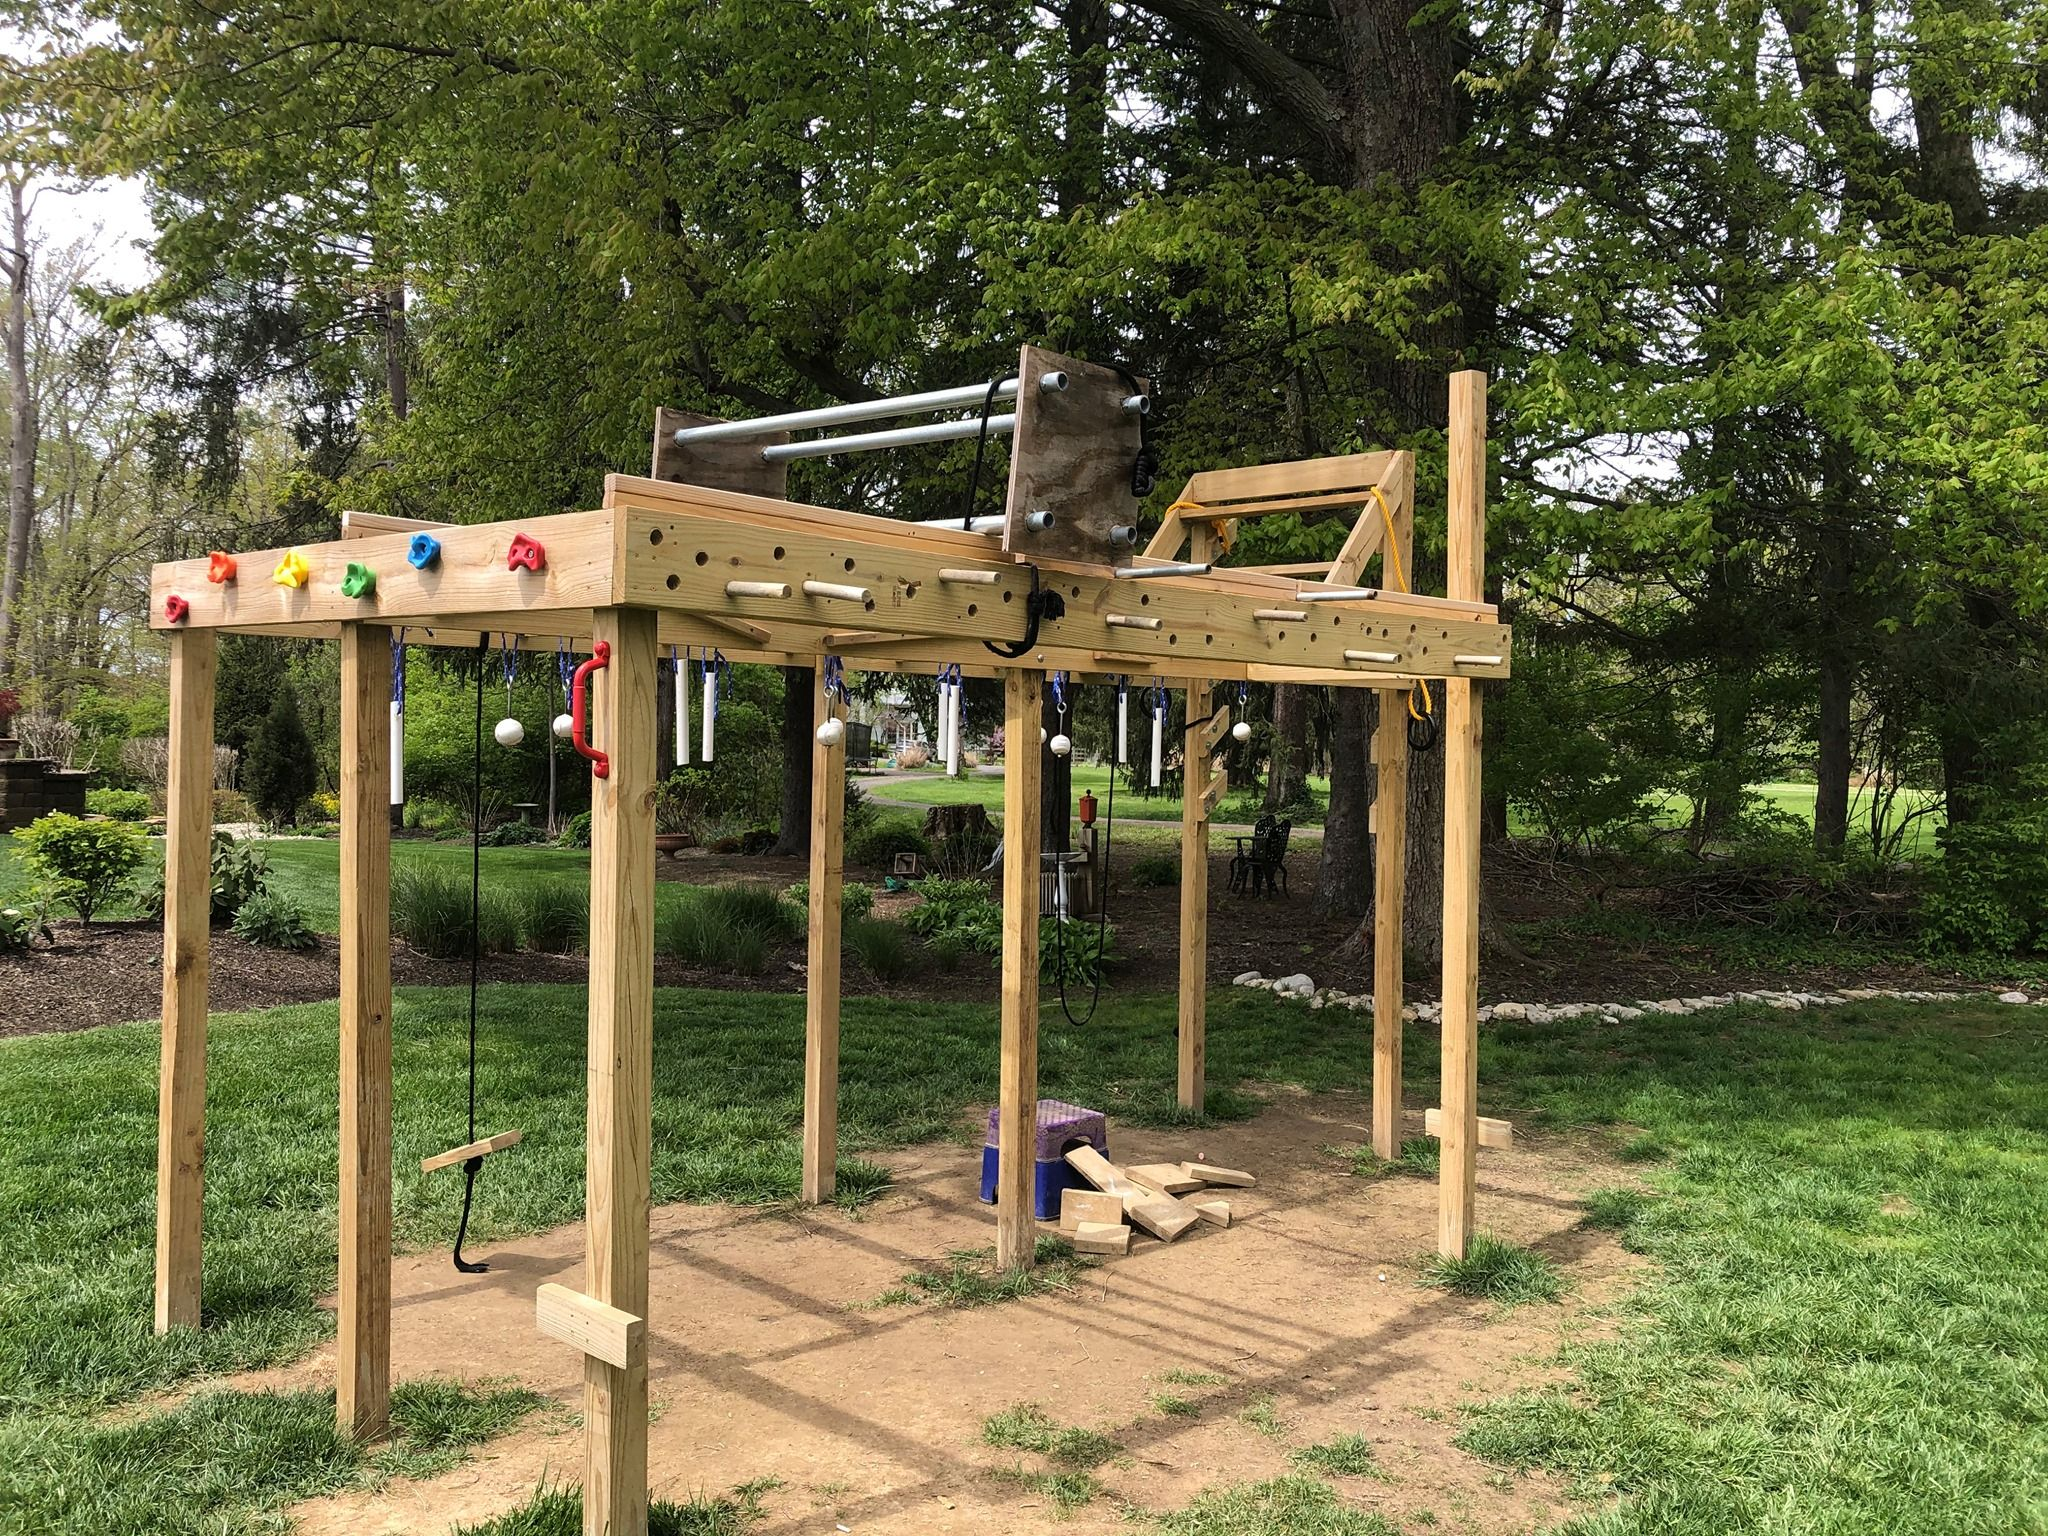 Diy Ninja Warrior Course For Kids Ninja Warrior Course Backyard Obstacle Course Ninja Warrior